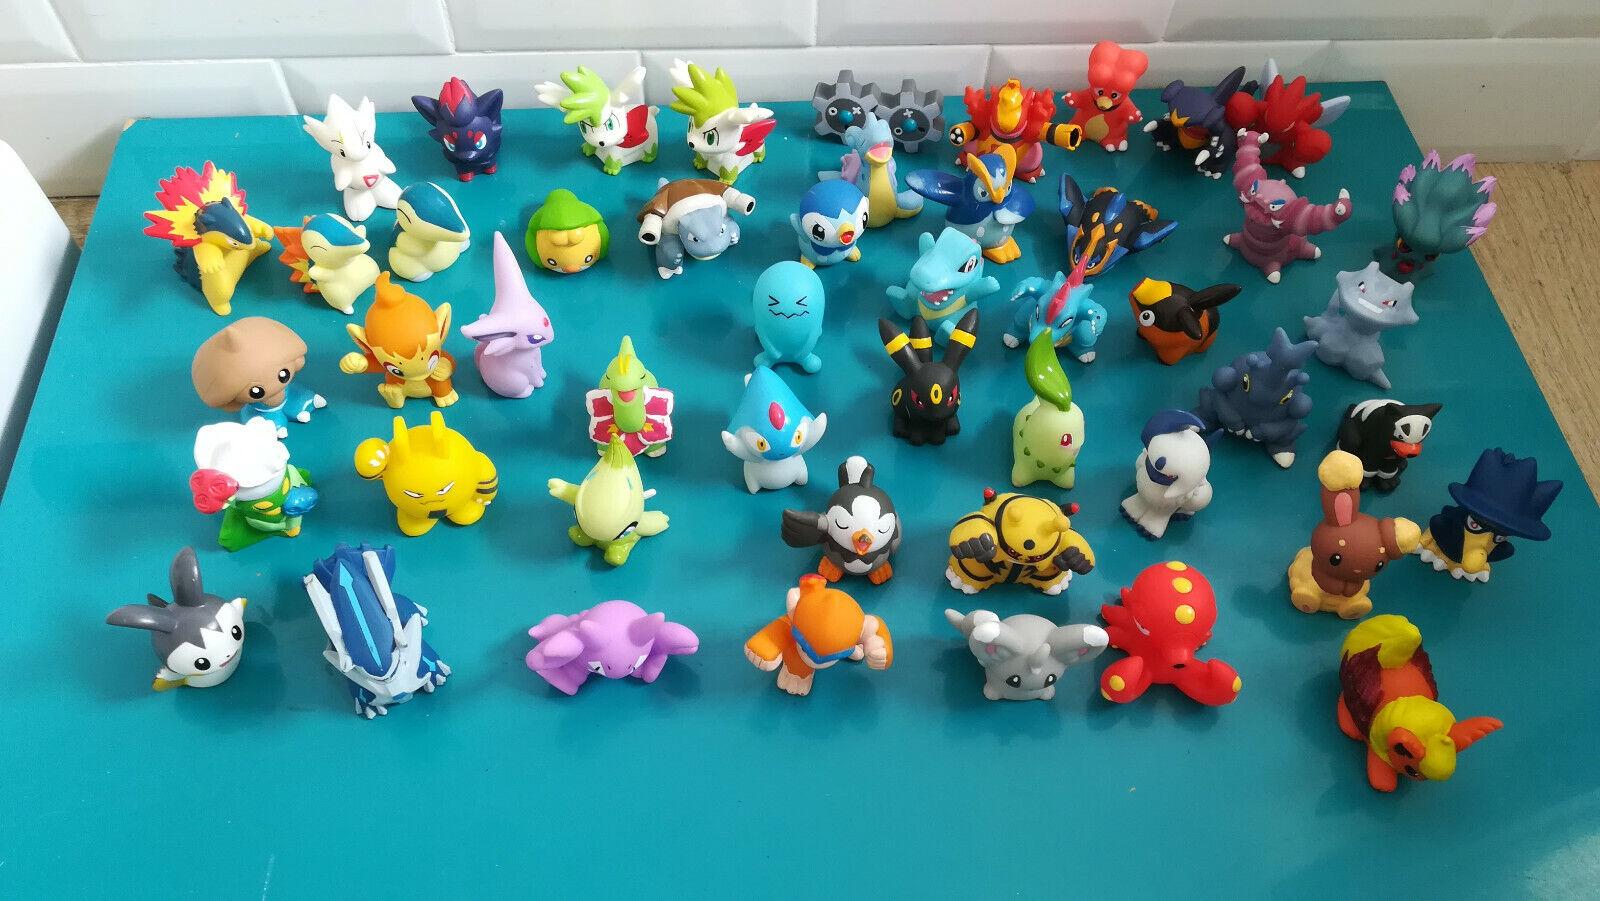 19.5.5.3 Lot 49  Figurines différentes Pokémon BeAI 2 à 5cm  presa